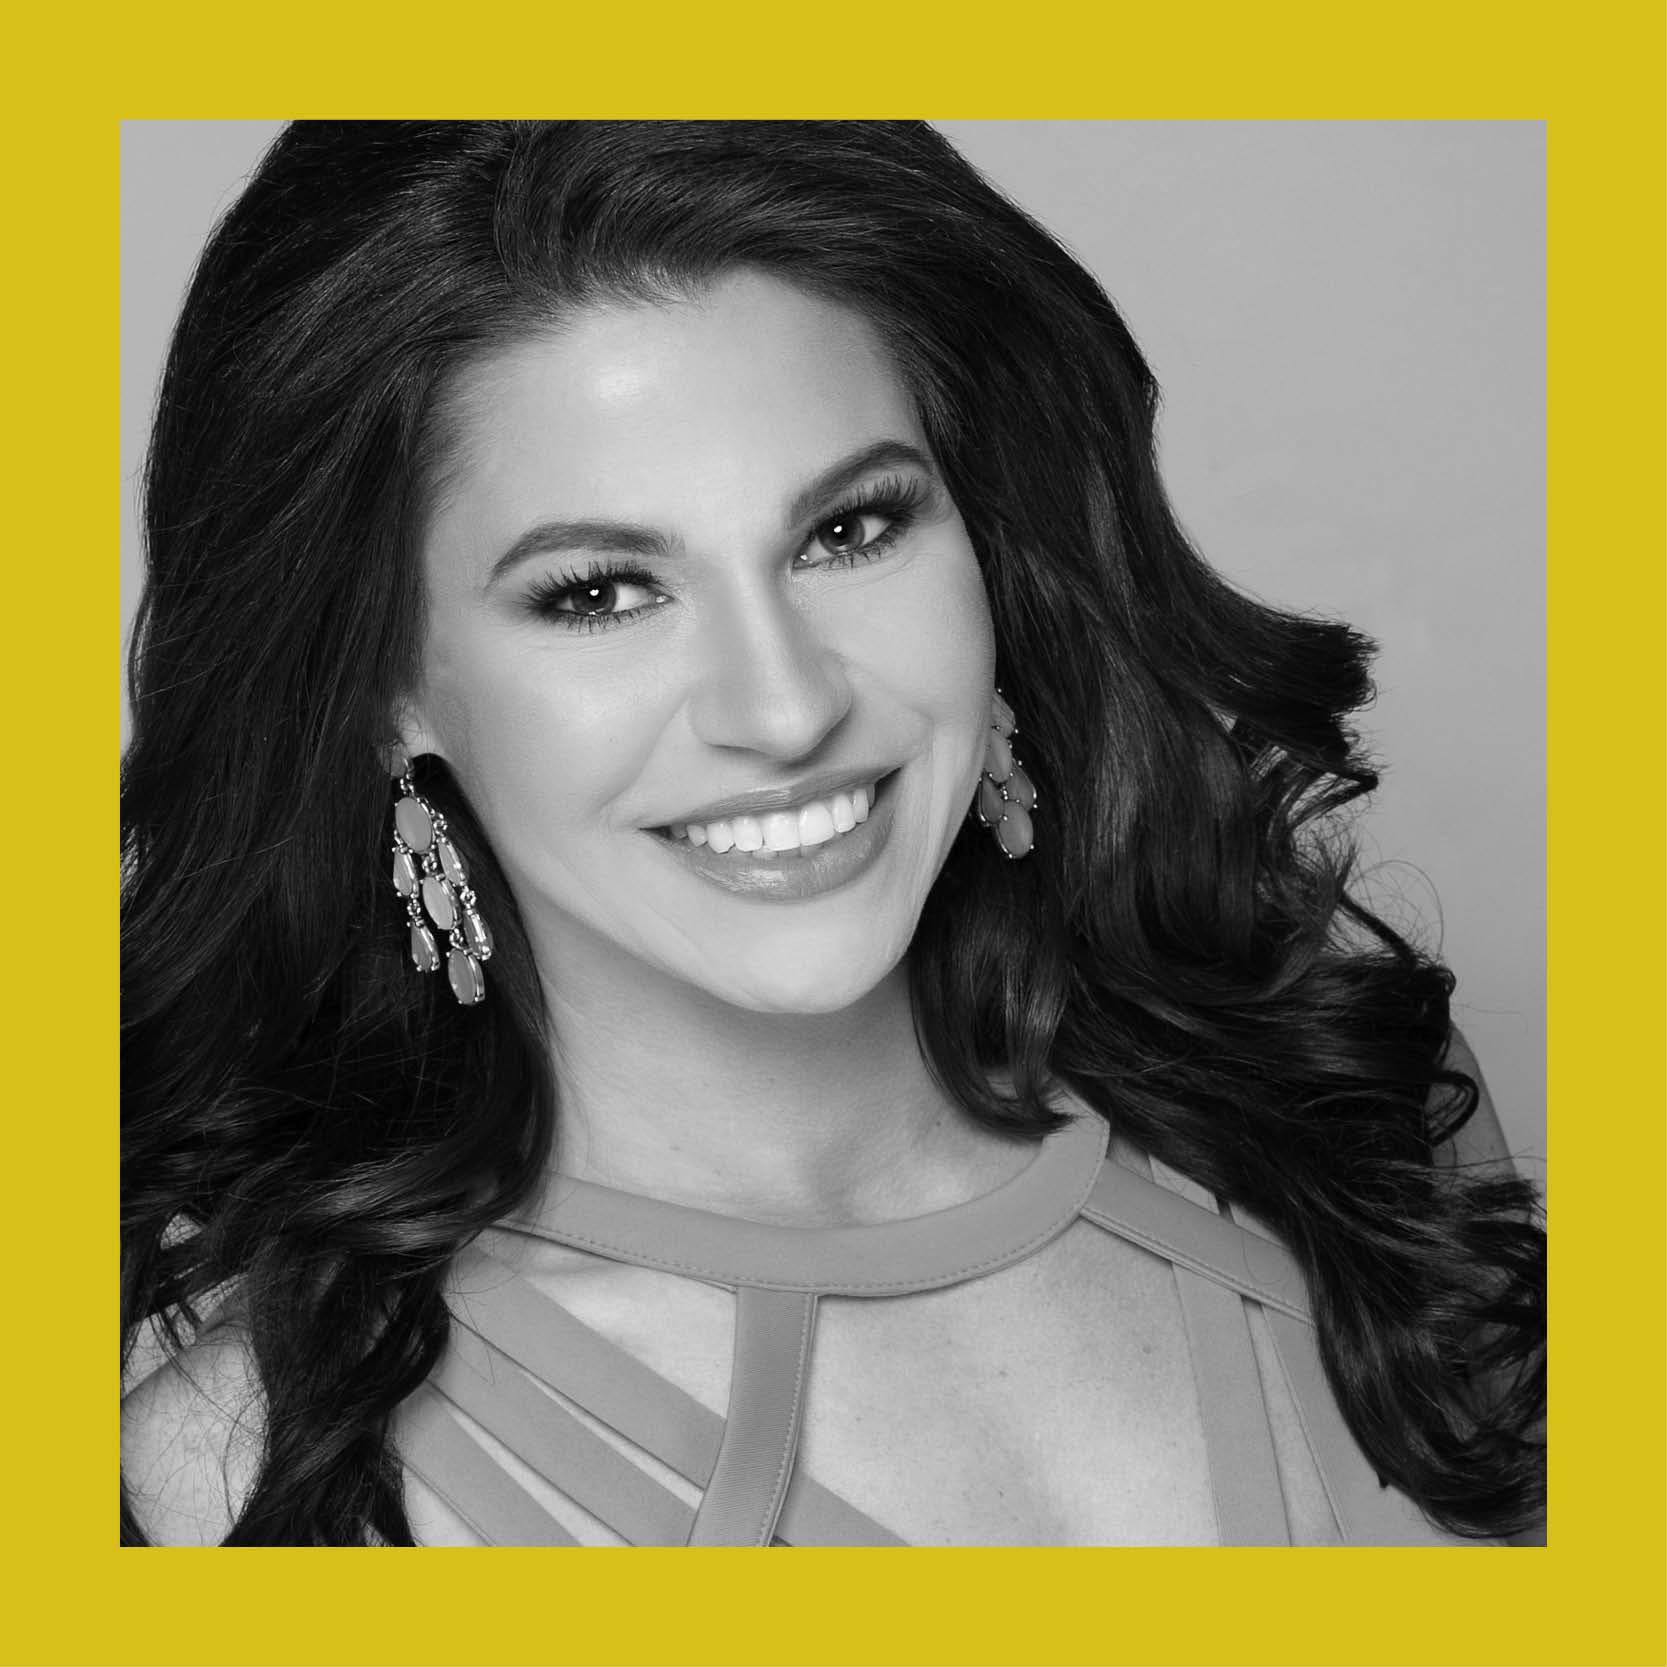 Marisa F  Hair Stylist and Makeup Artist